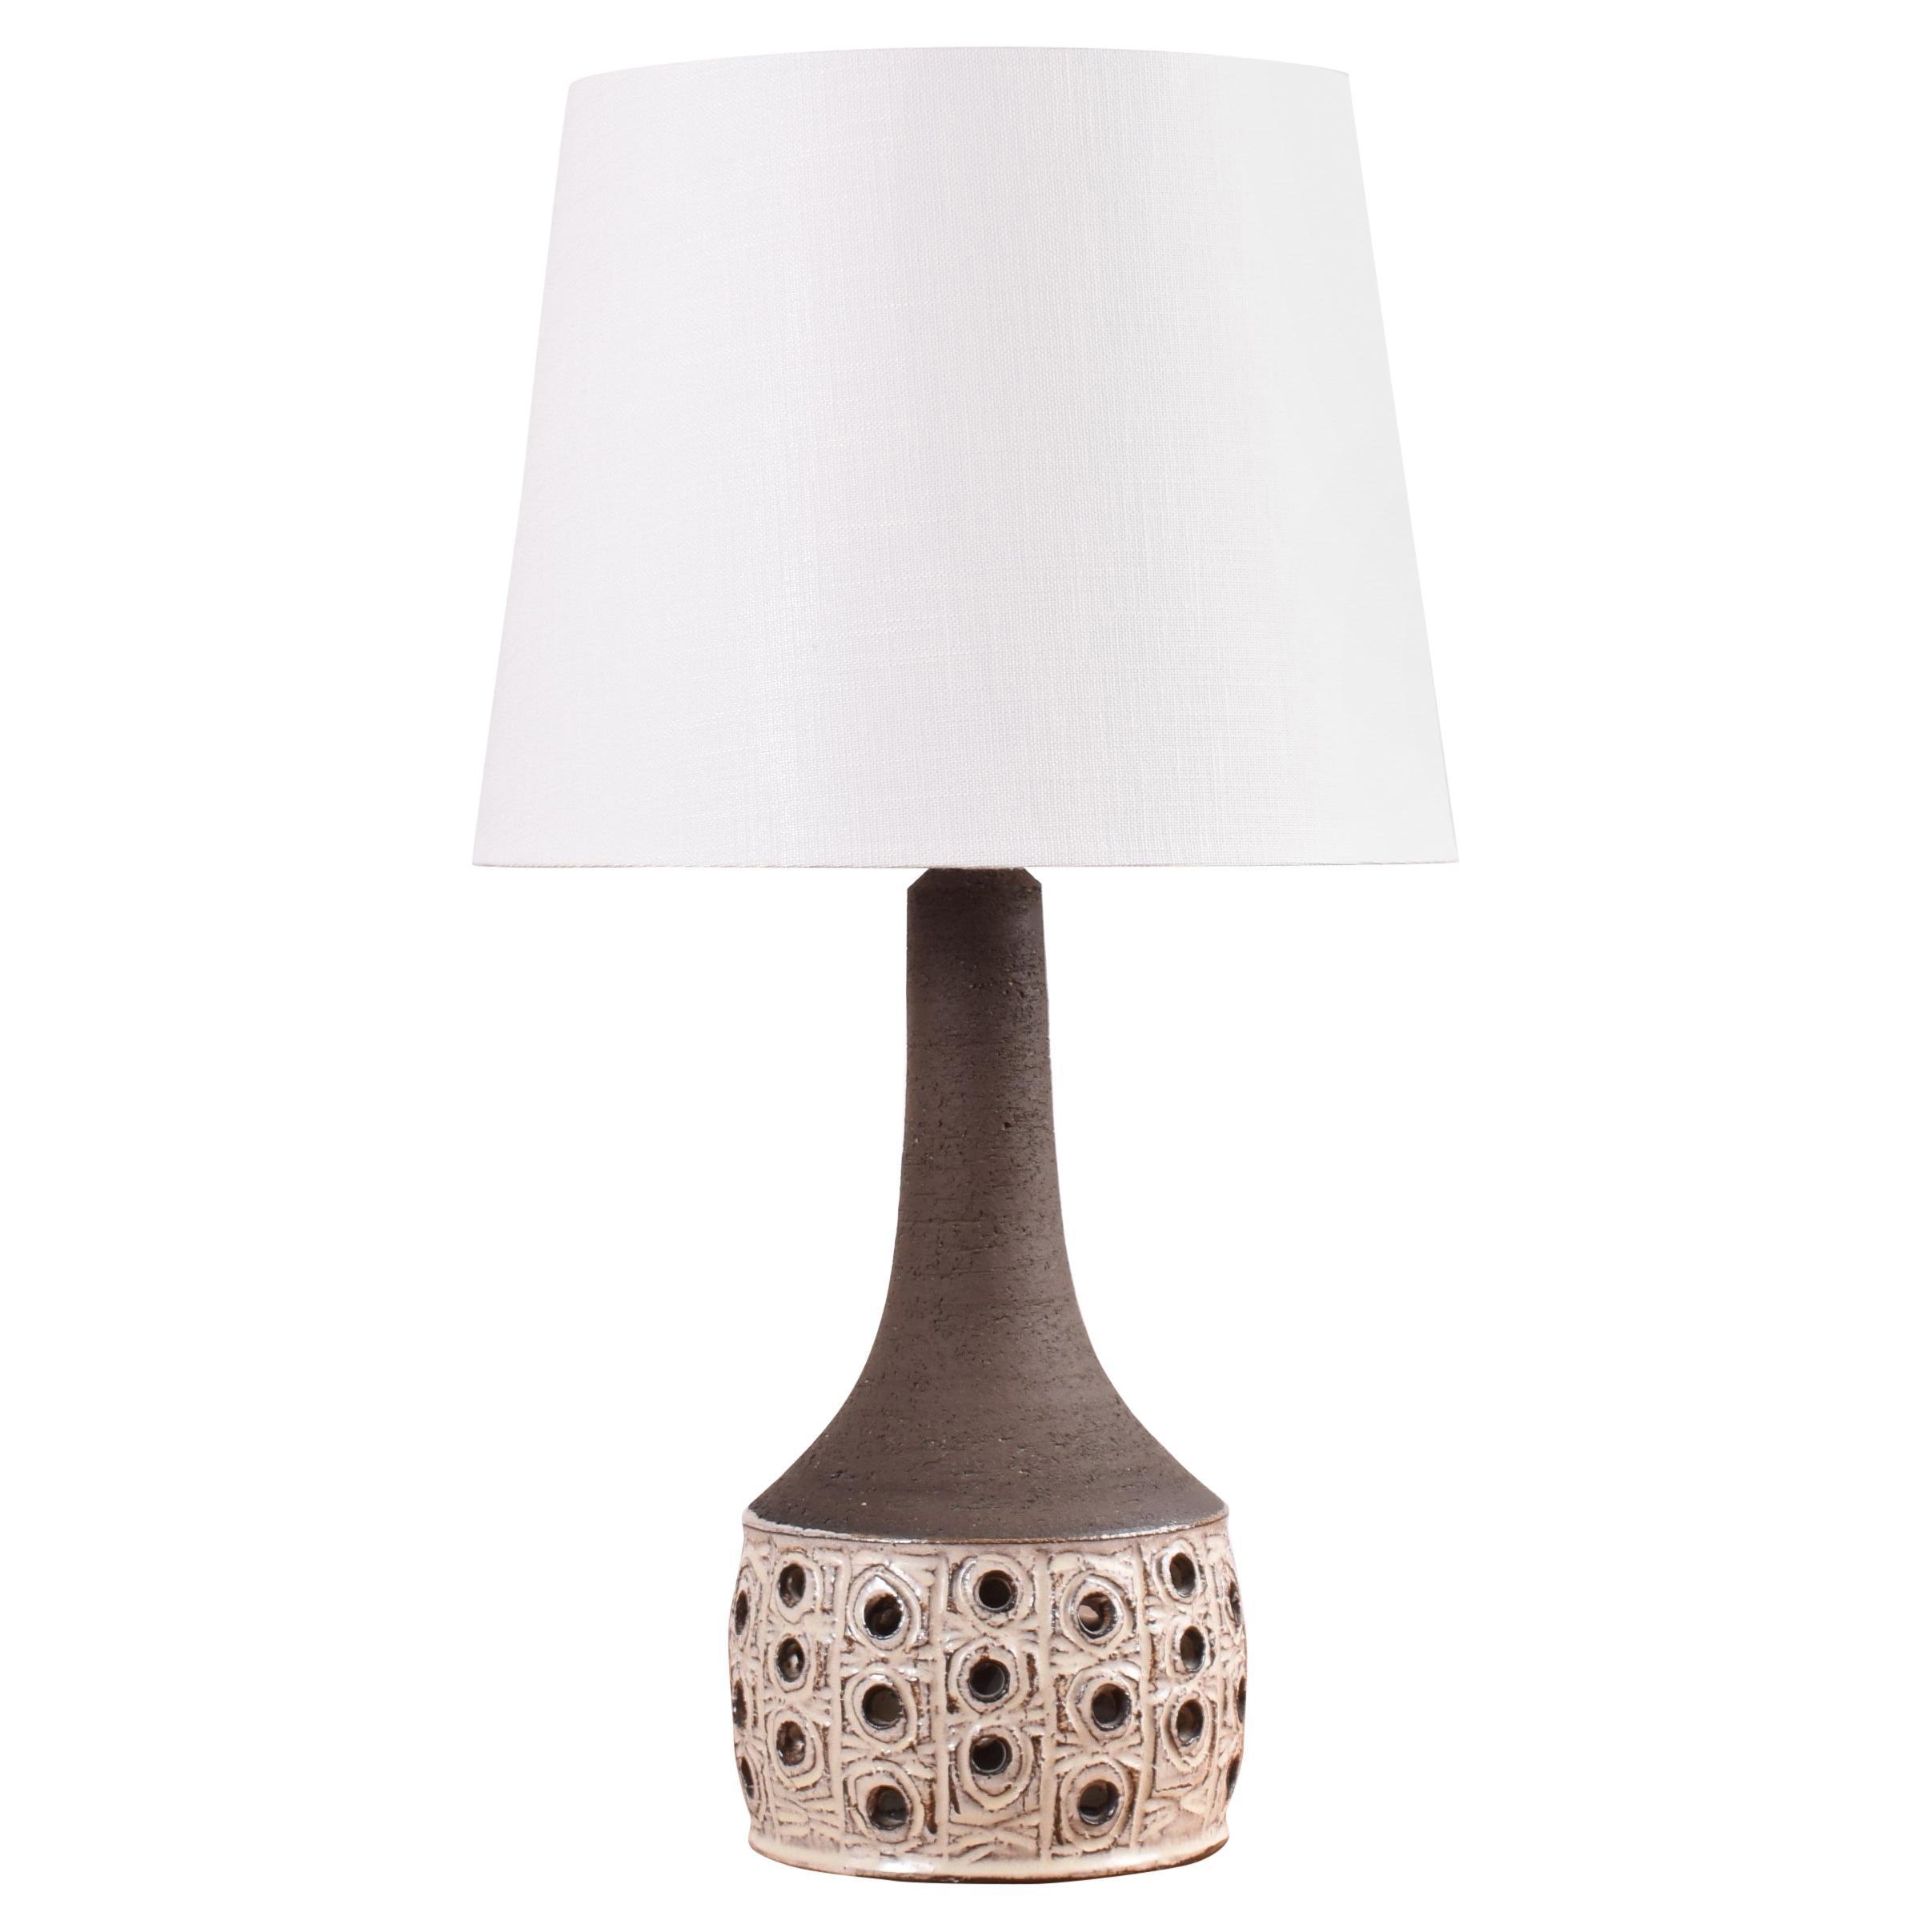 Jette Hellerøe Midcentury Danish Ceramic Table Lamp Beige and Brown, 1970s